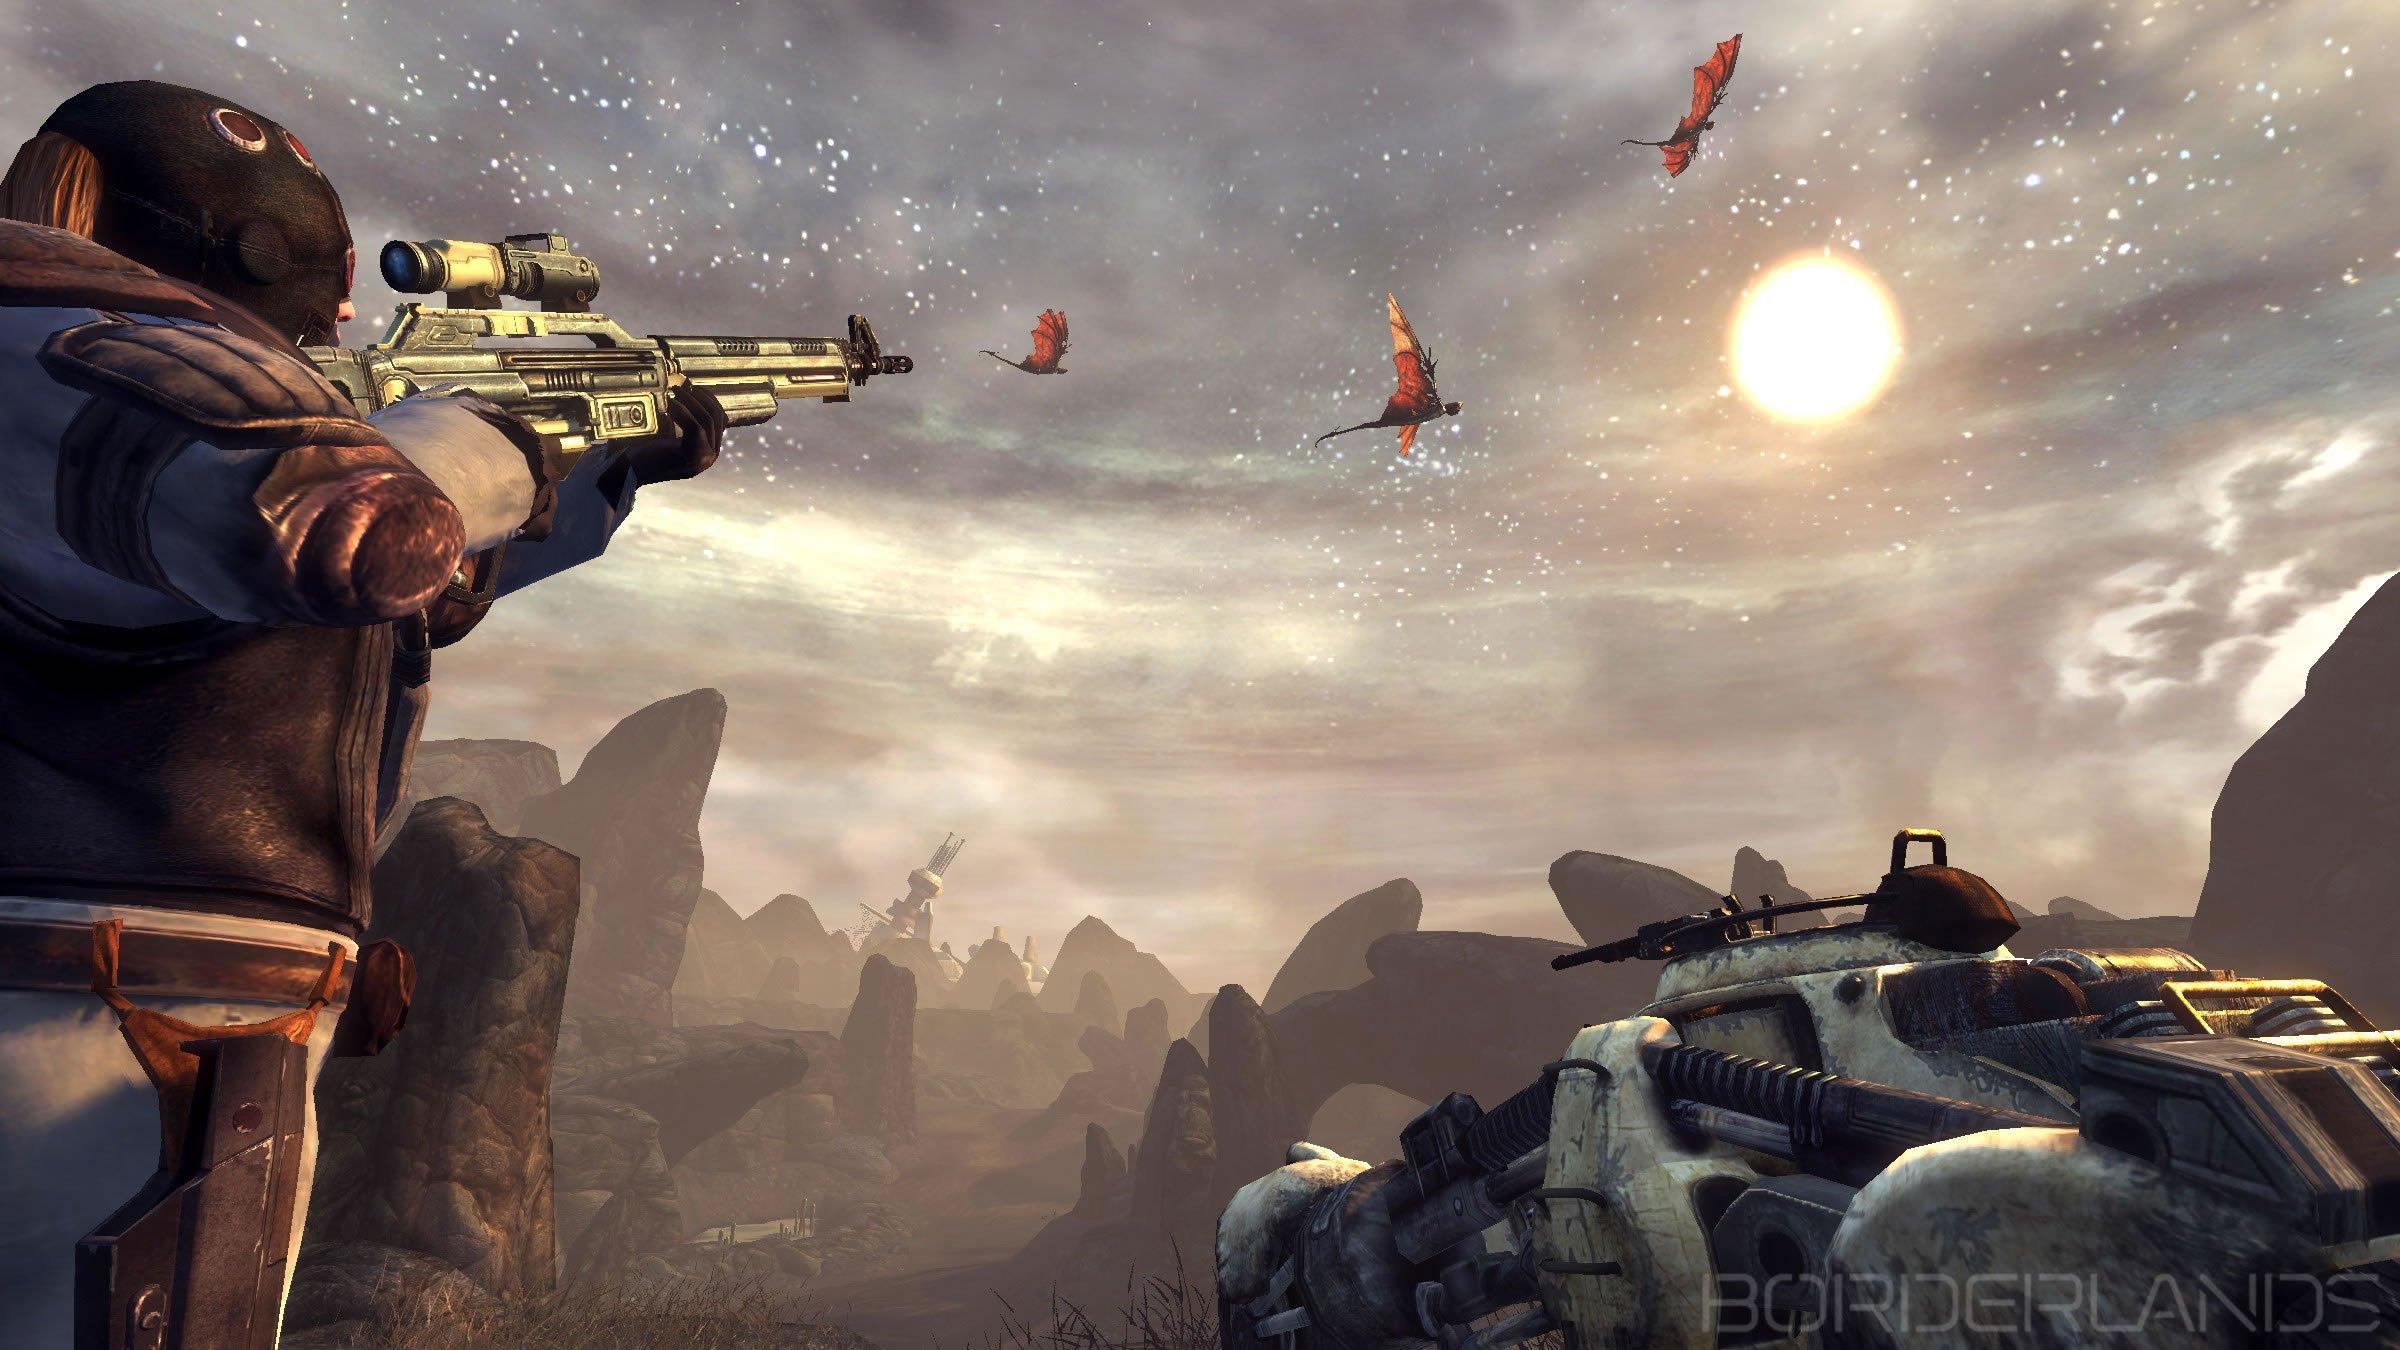 Fallout 3 And Borderlands Screenshot Comparison #4163